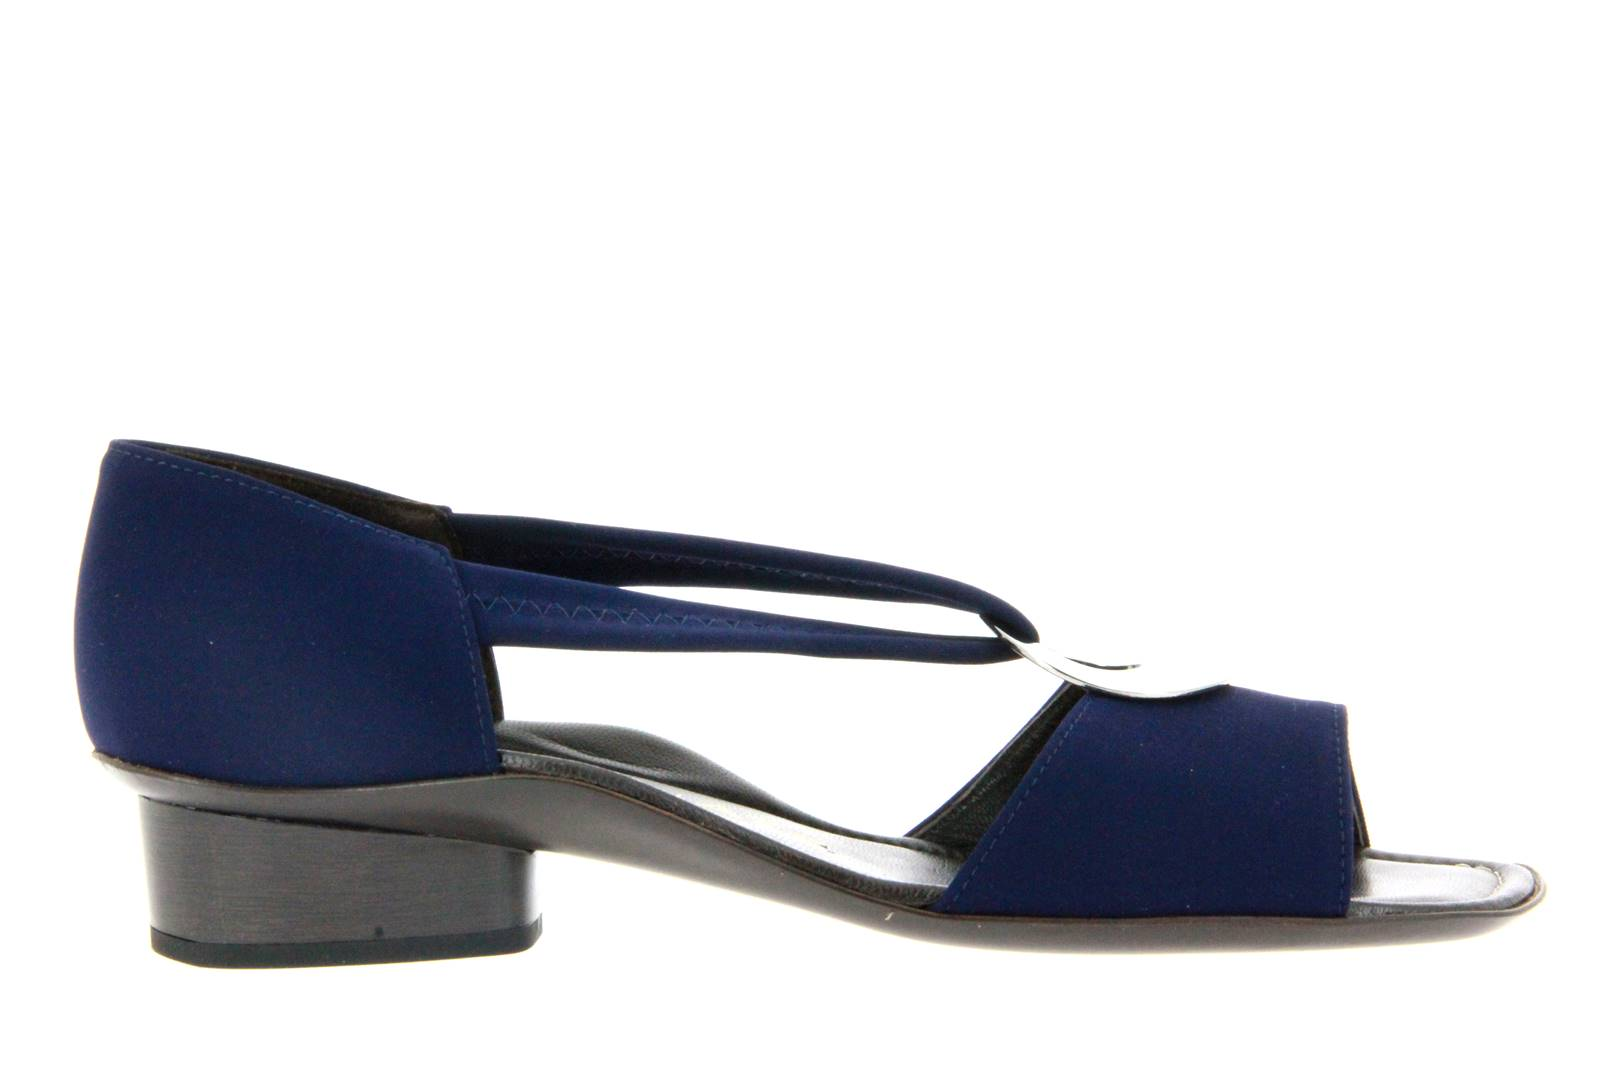 Brunate Sandale CLASSICO NICOLE STEP NIGHT (36)